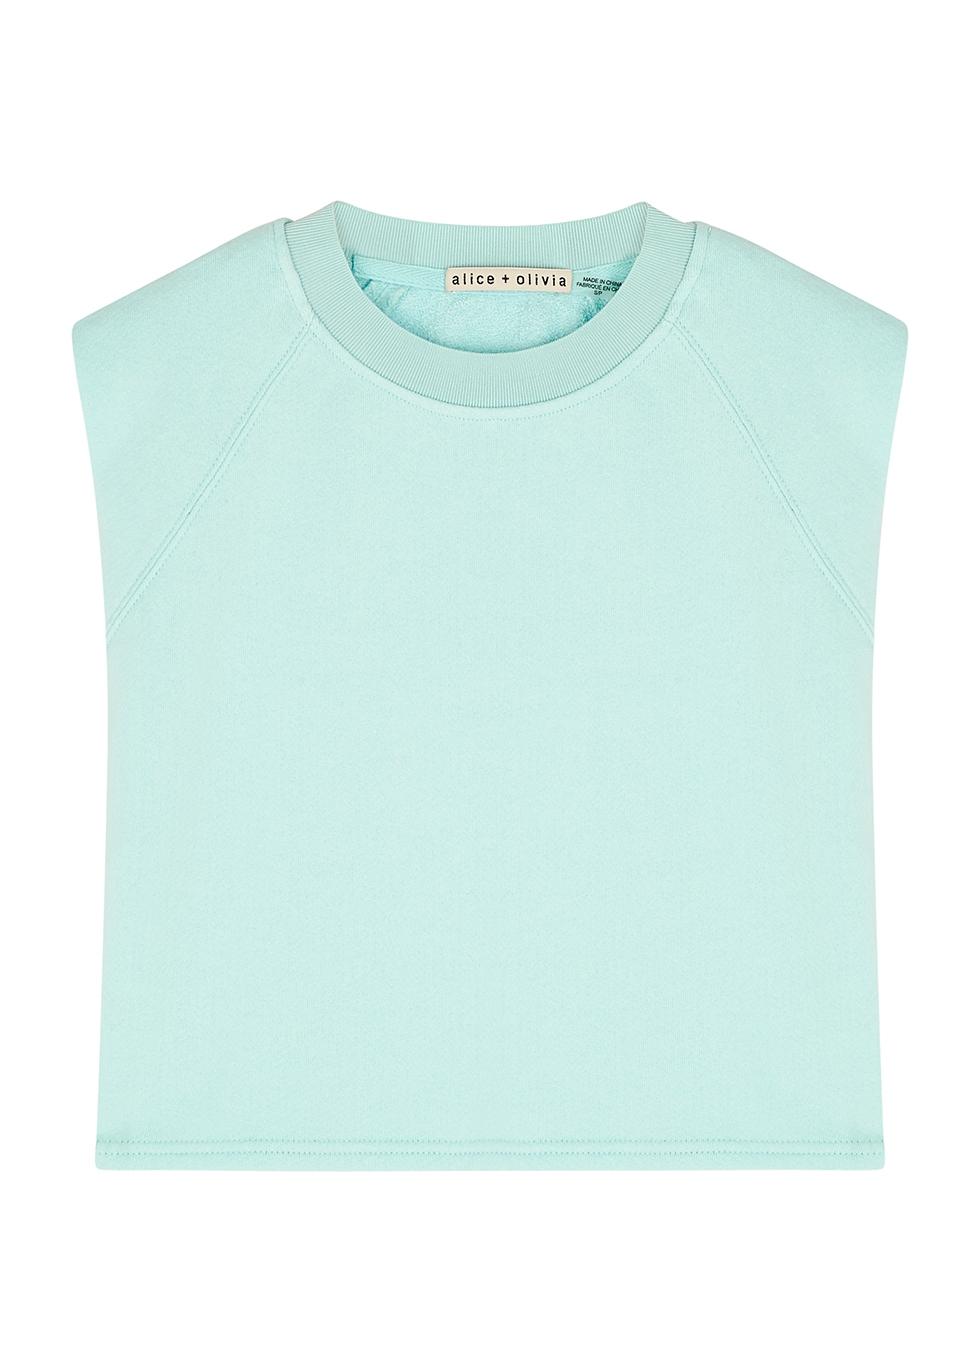 Braxton light blue cropped jersey top